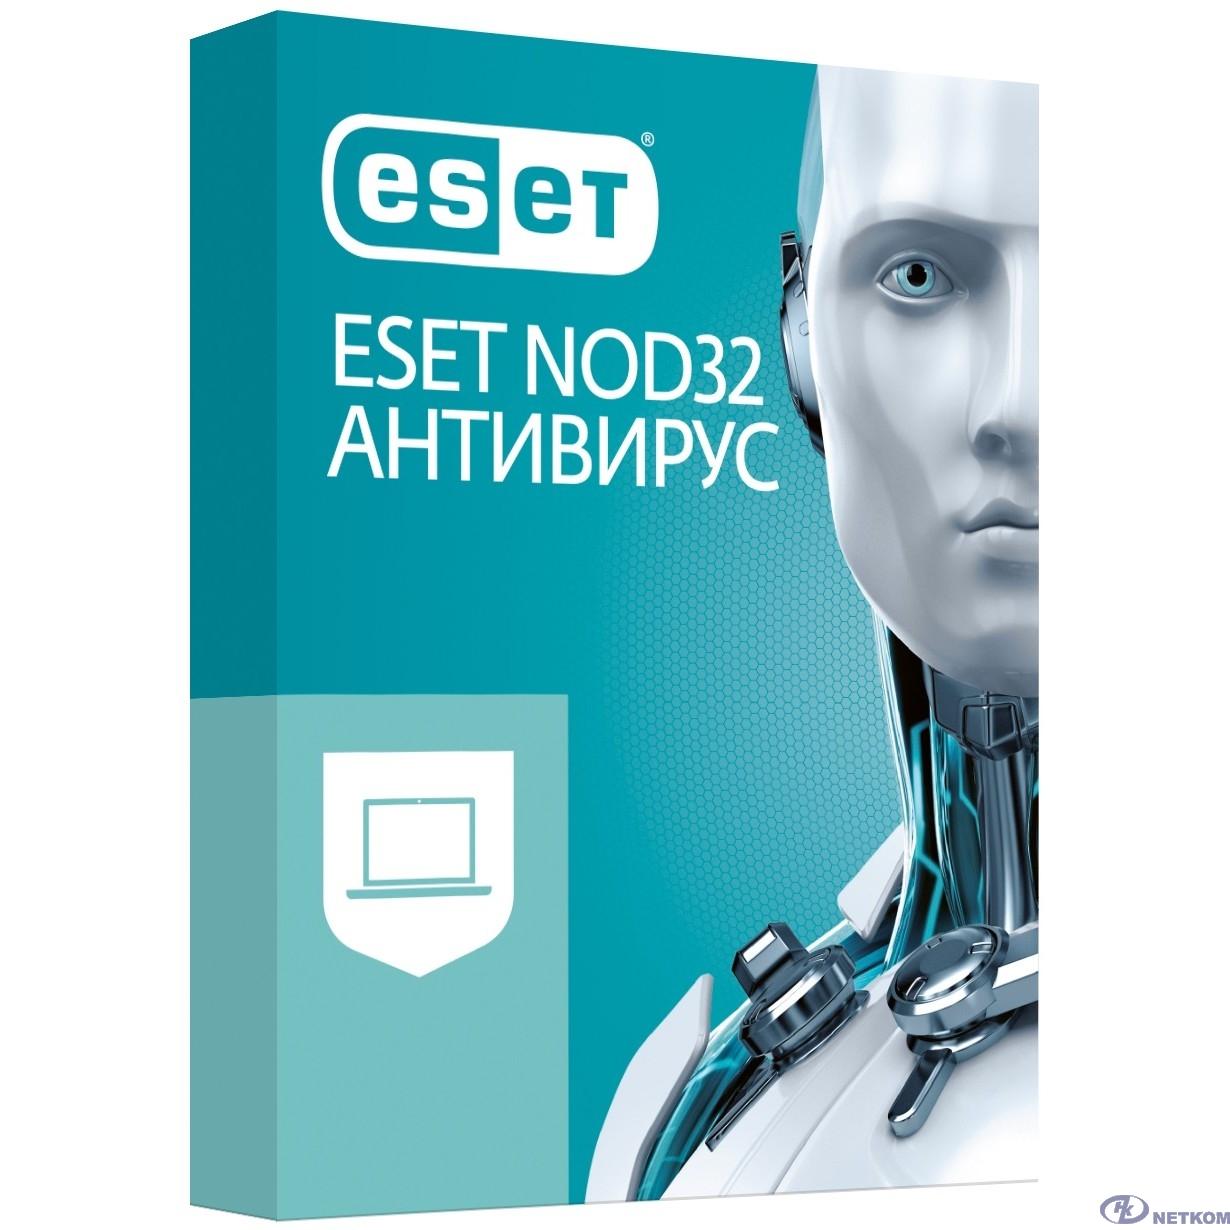 NOD32-ENA-NS(ABOX)-1-1 ESET NOD32 Антивирус - лицензия на 1 год на 1ПК [310978]